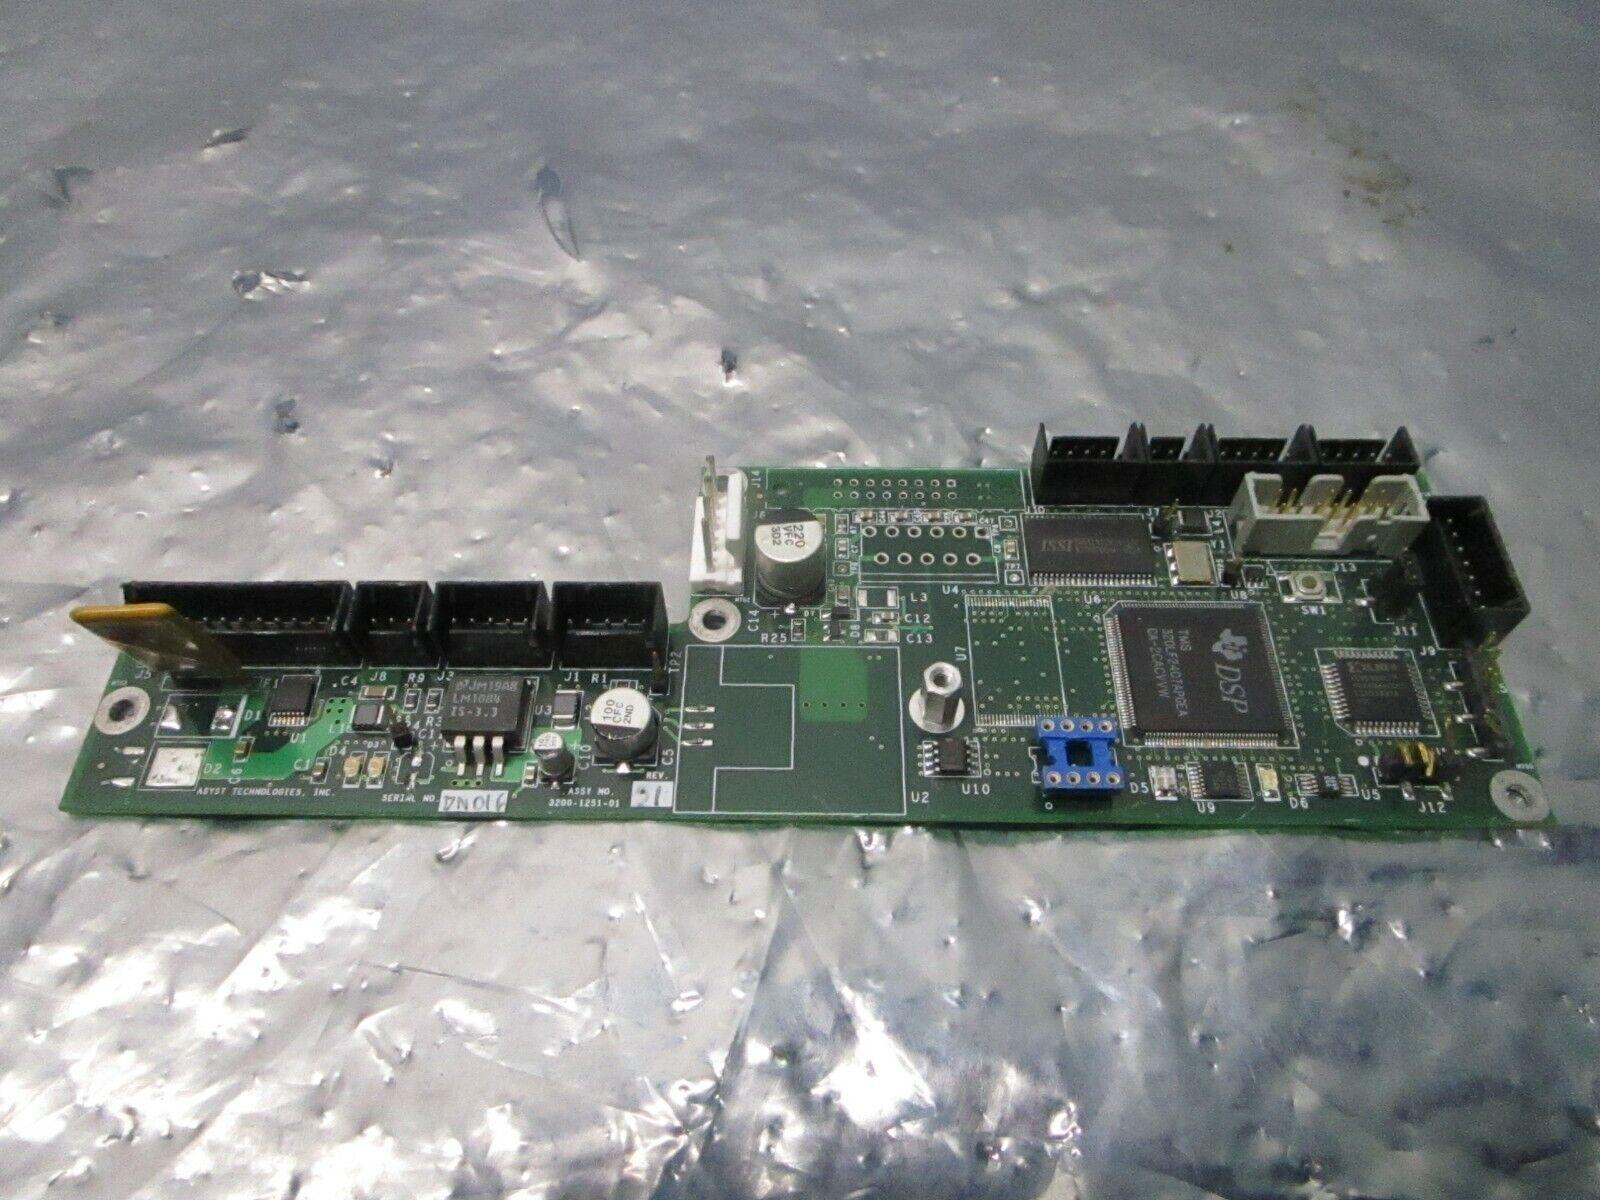 Asyst 3200-1251-01 Door Controller Board, PCB, FAB 3000-1251-01, 101183